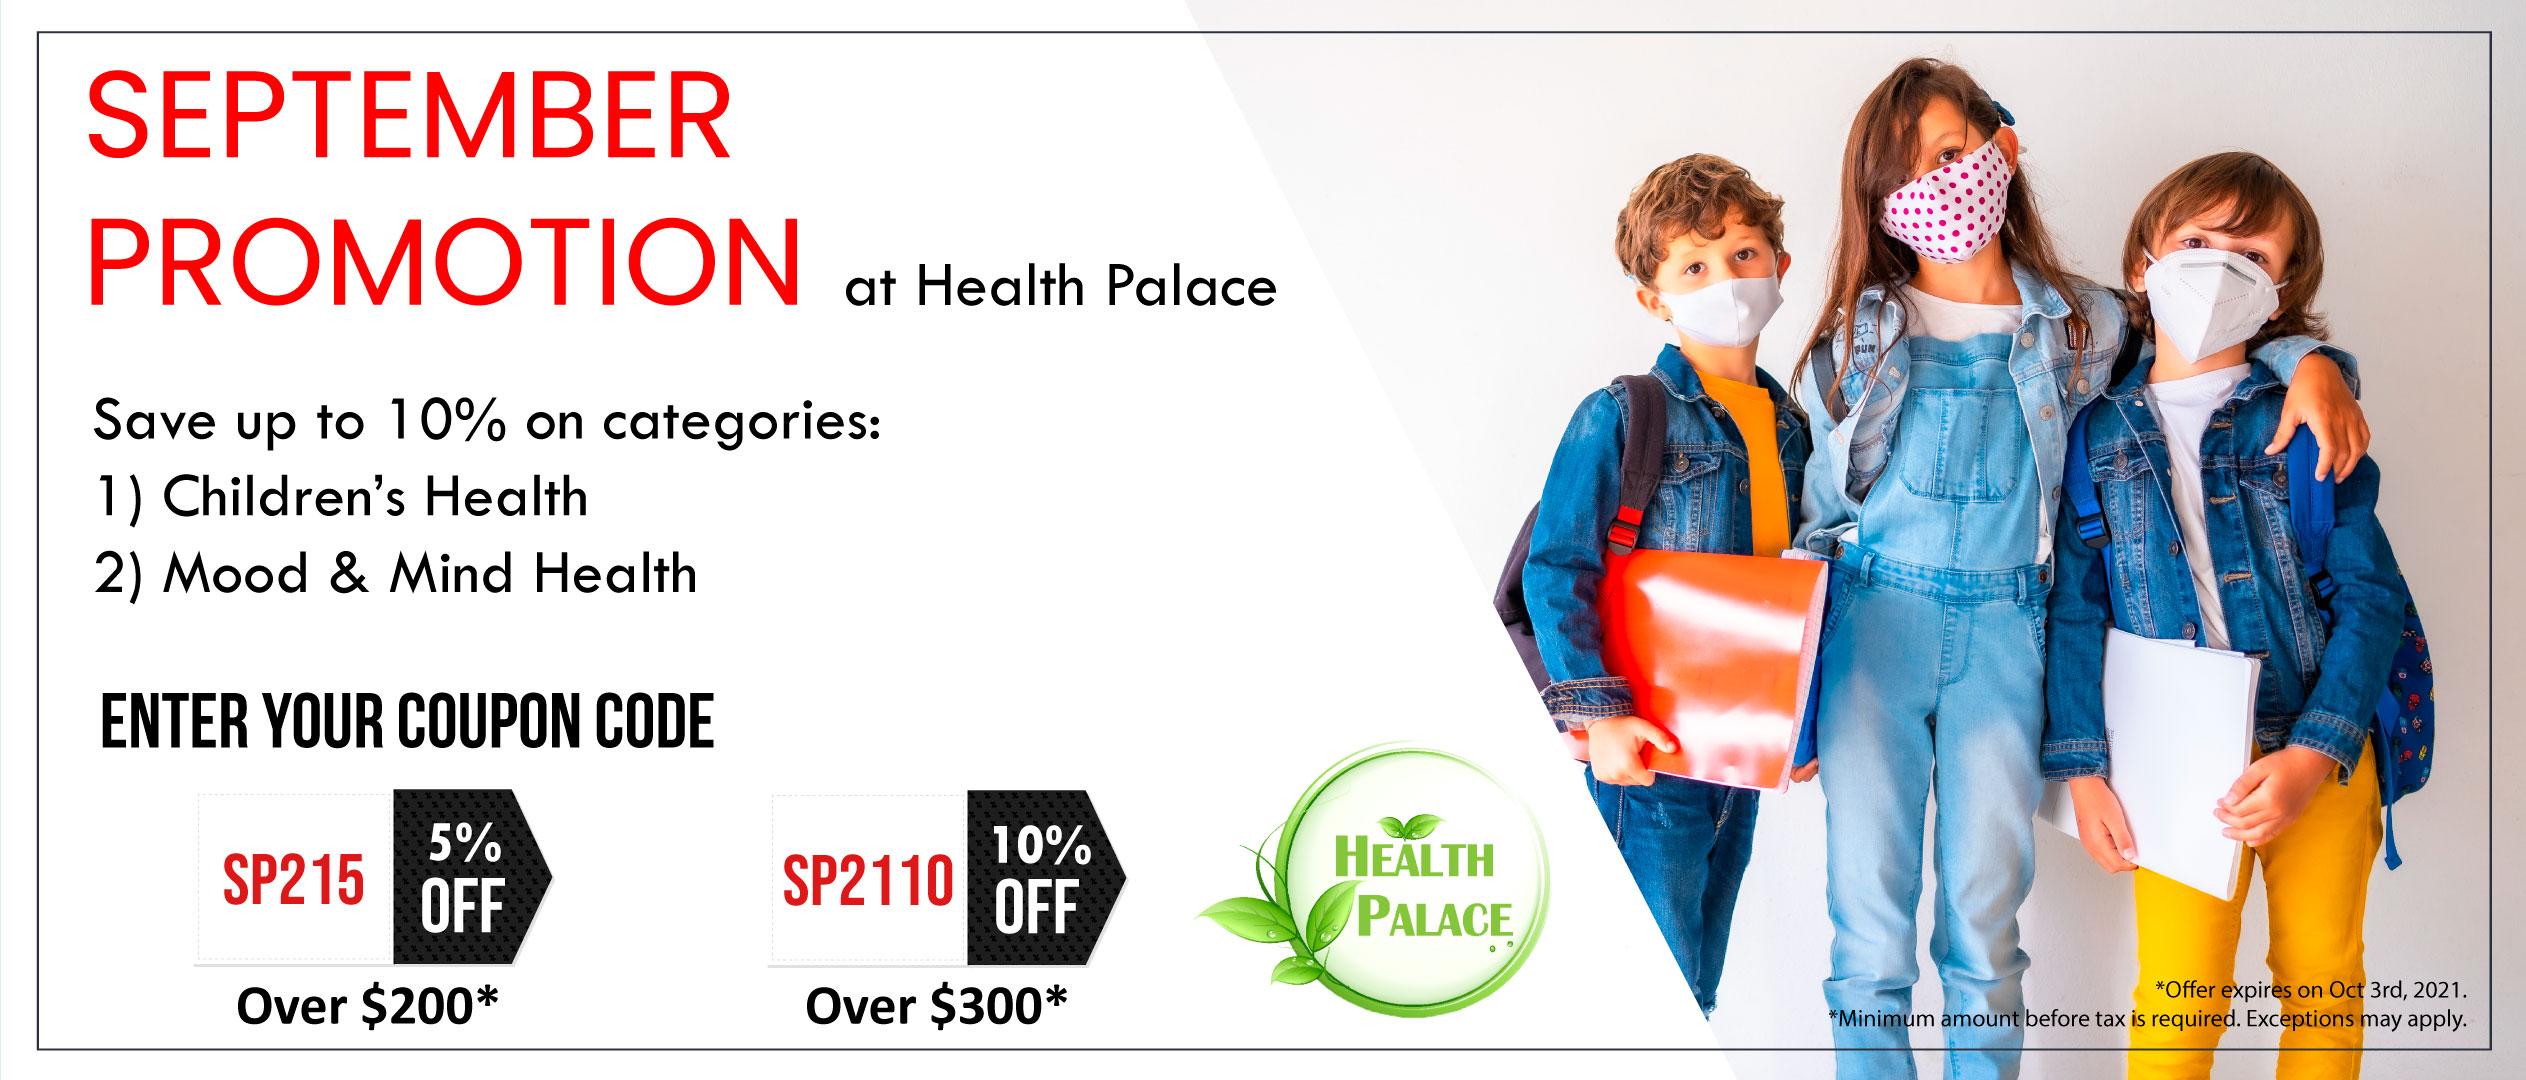 health-palace-promo-sept-2021.jpg